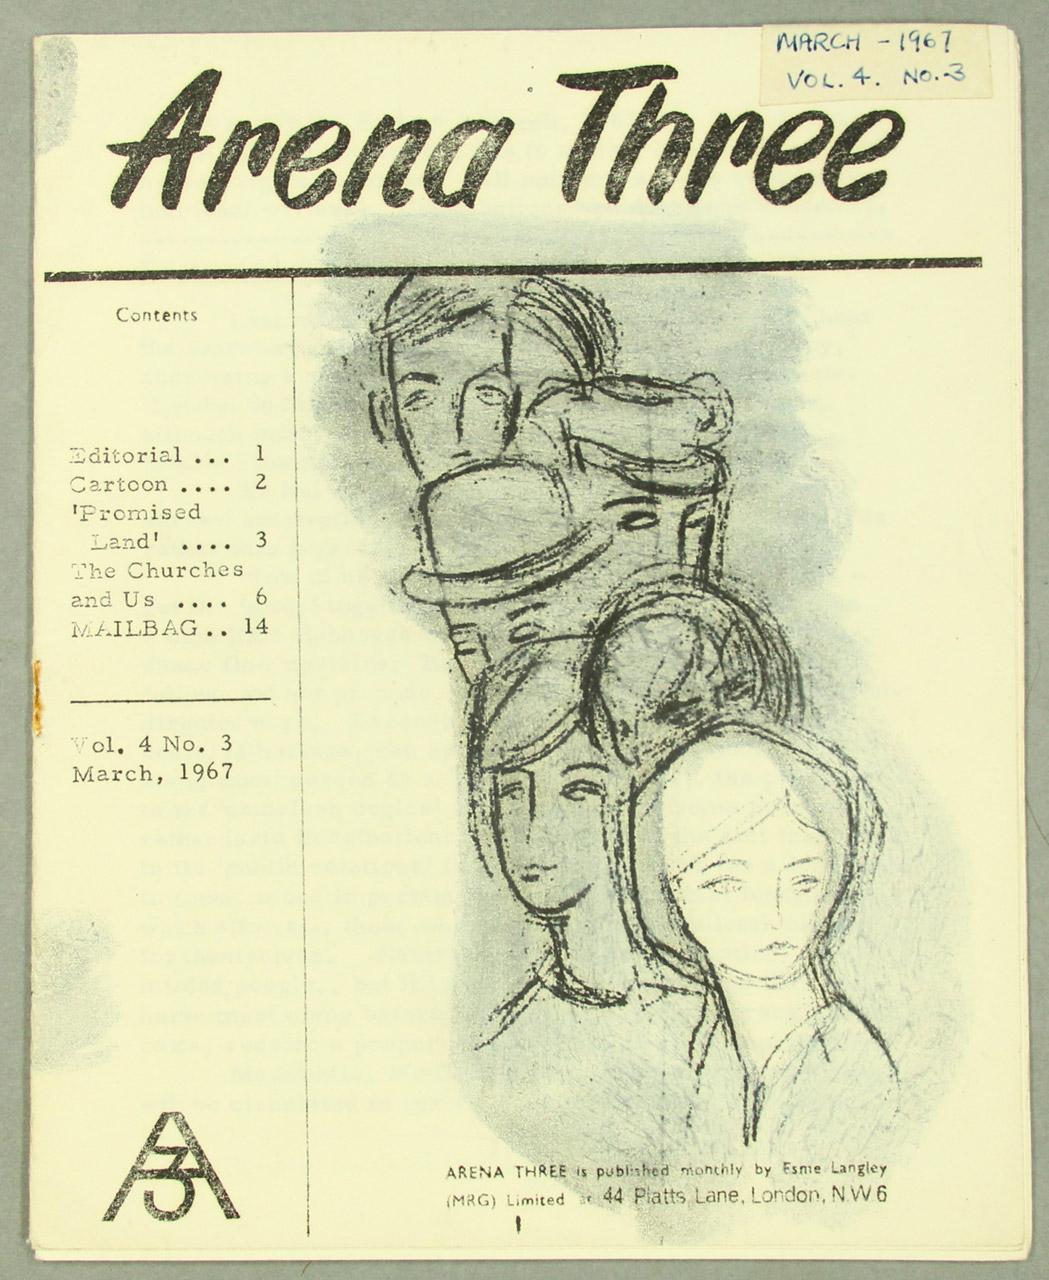 Arena 3, March 1967, Volume 4, Number 3